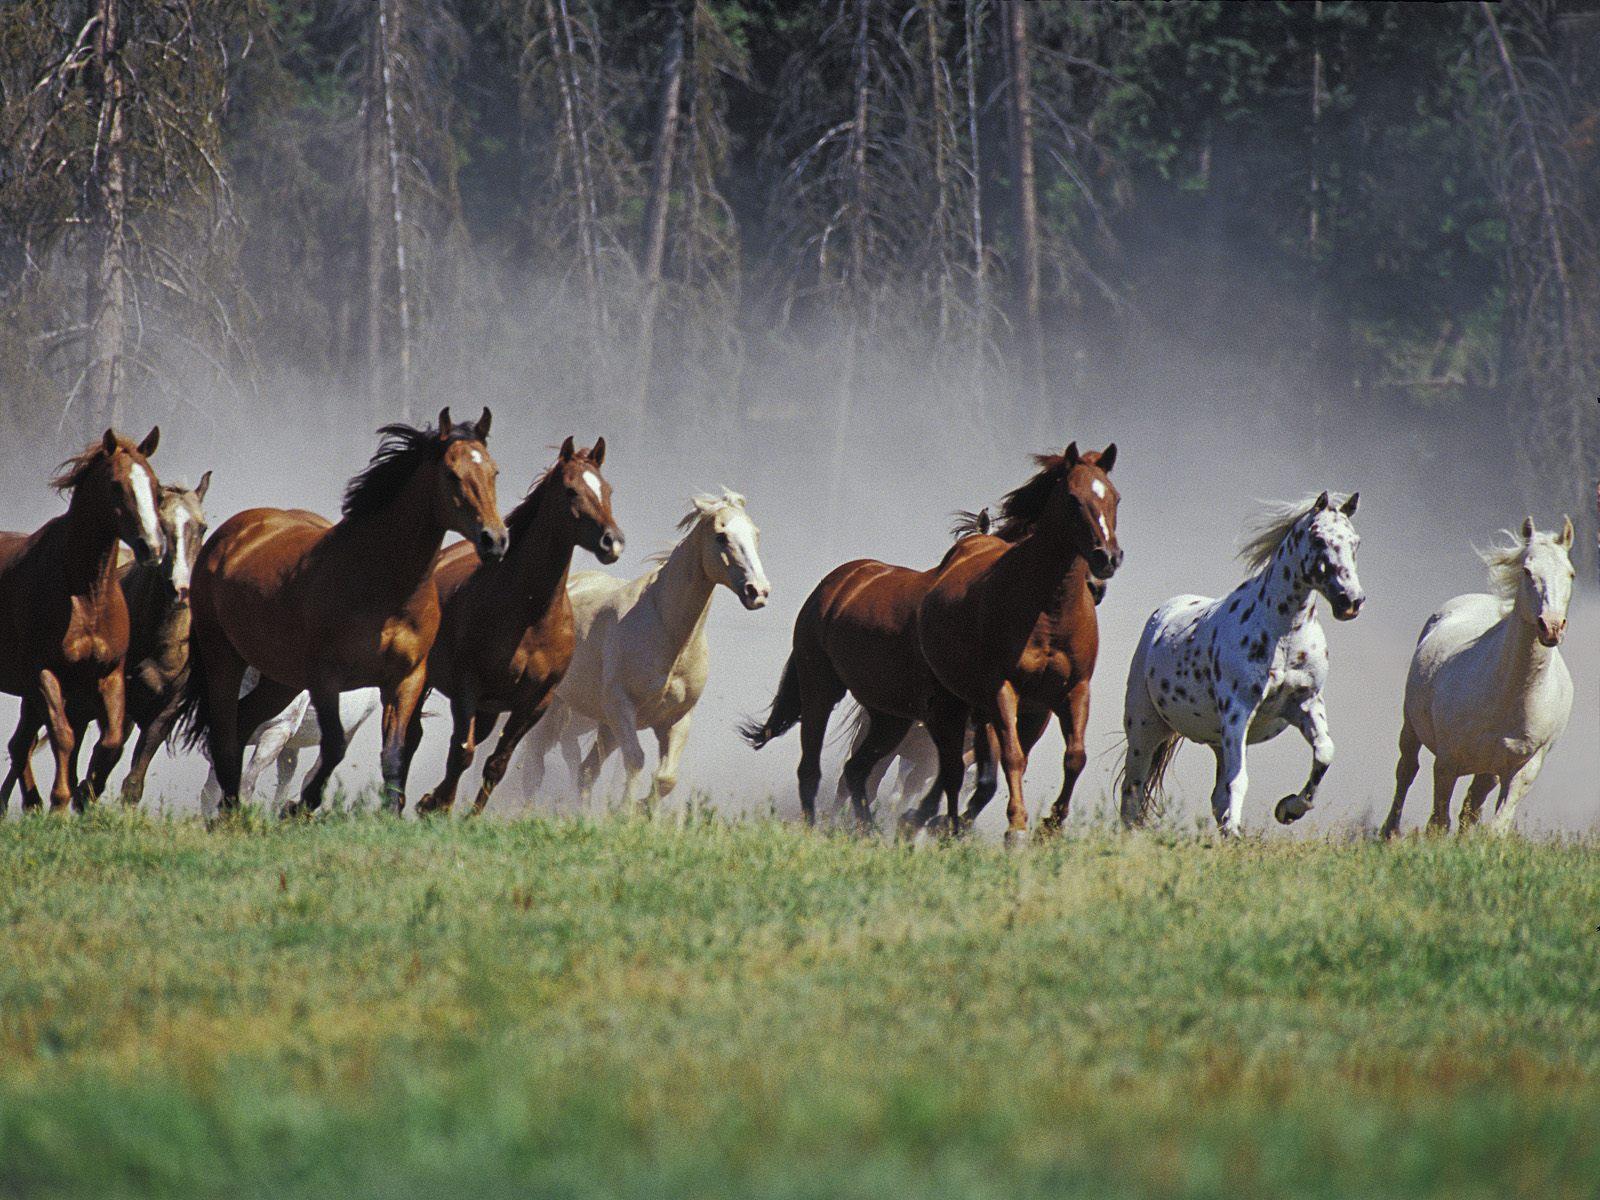 Best Beautiful hd wallpapers for Desktop Basckground: Horse wallpapers hd